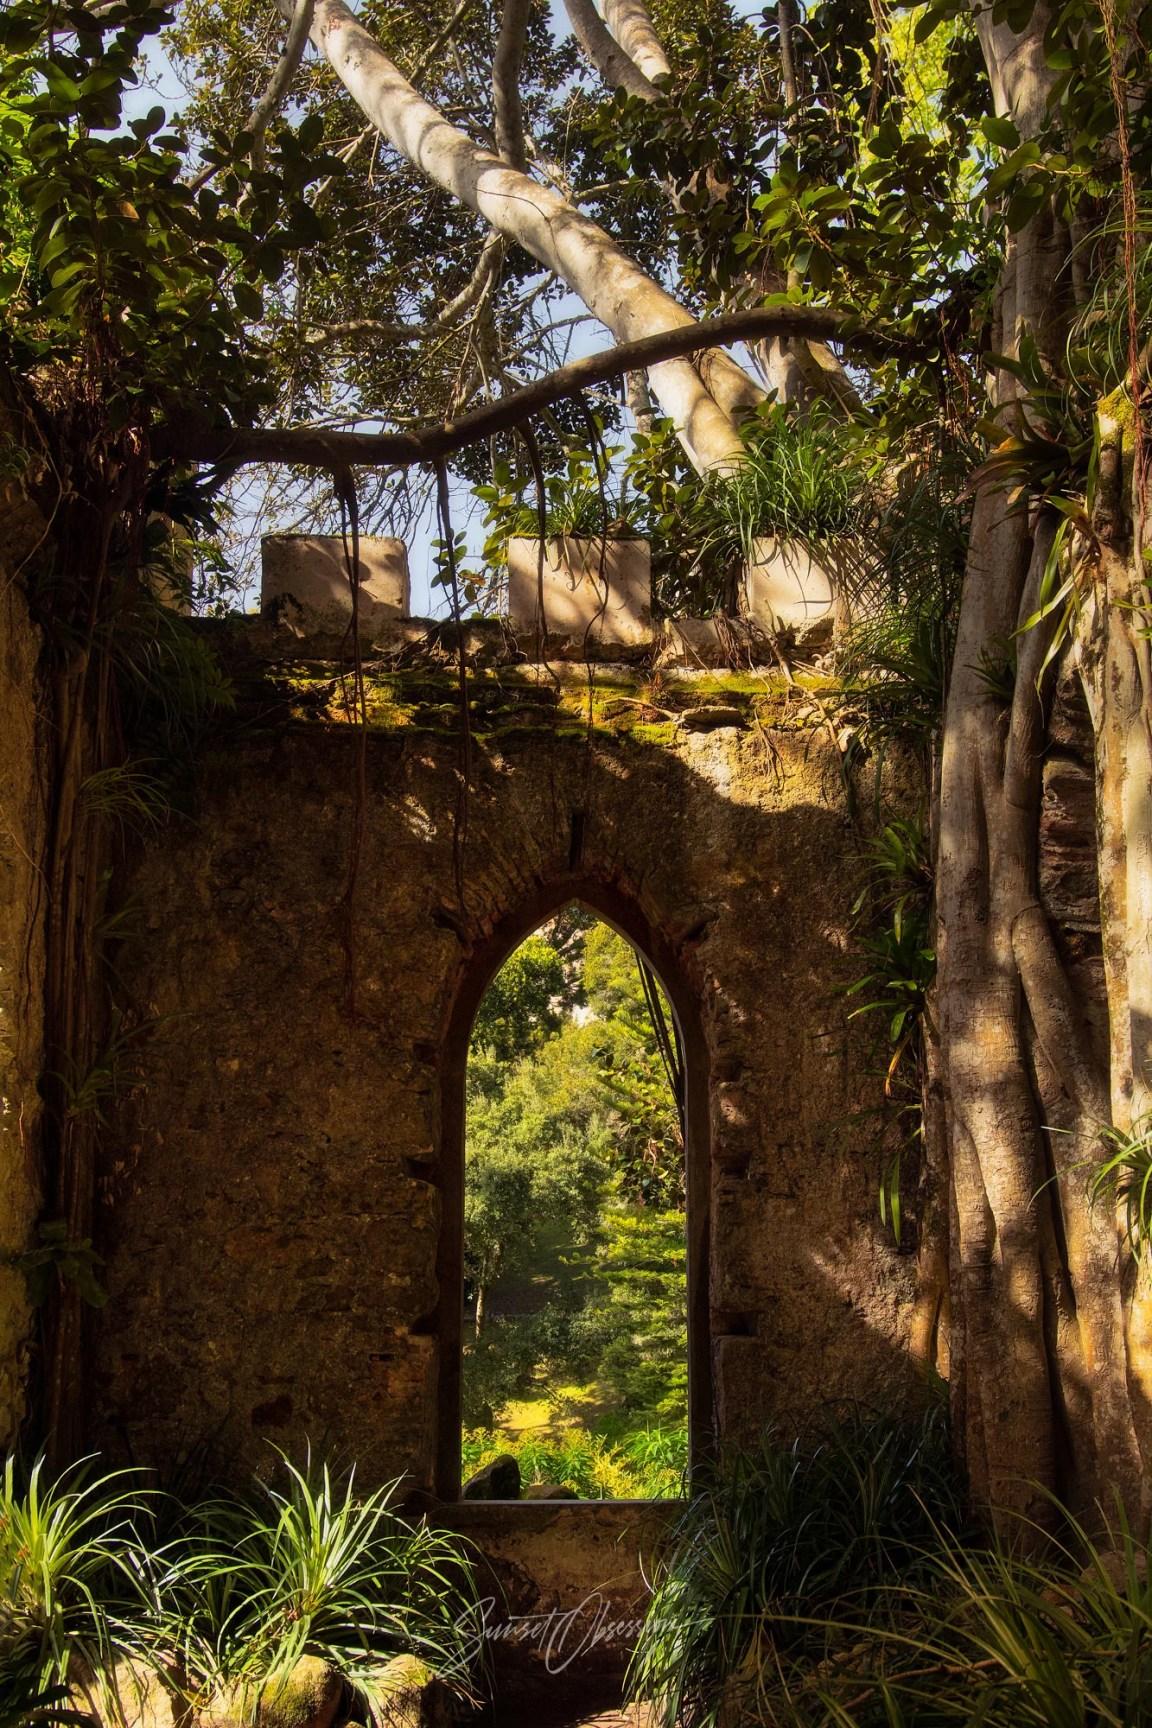 The false chapel ruin in Monserrate is really pretty convincing!